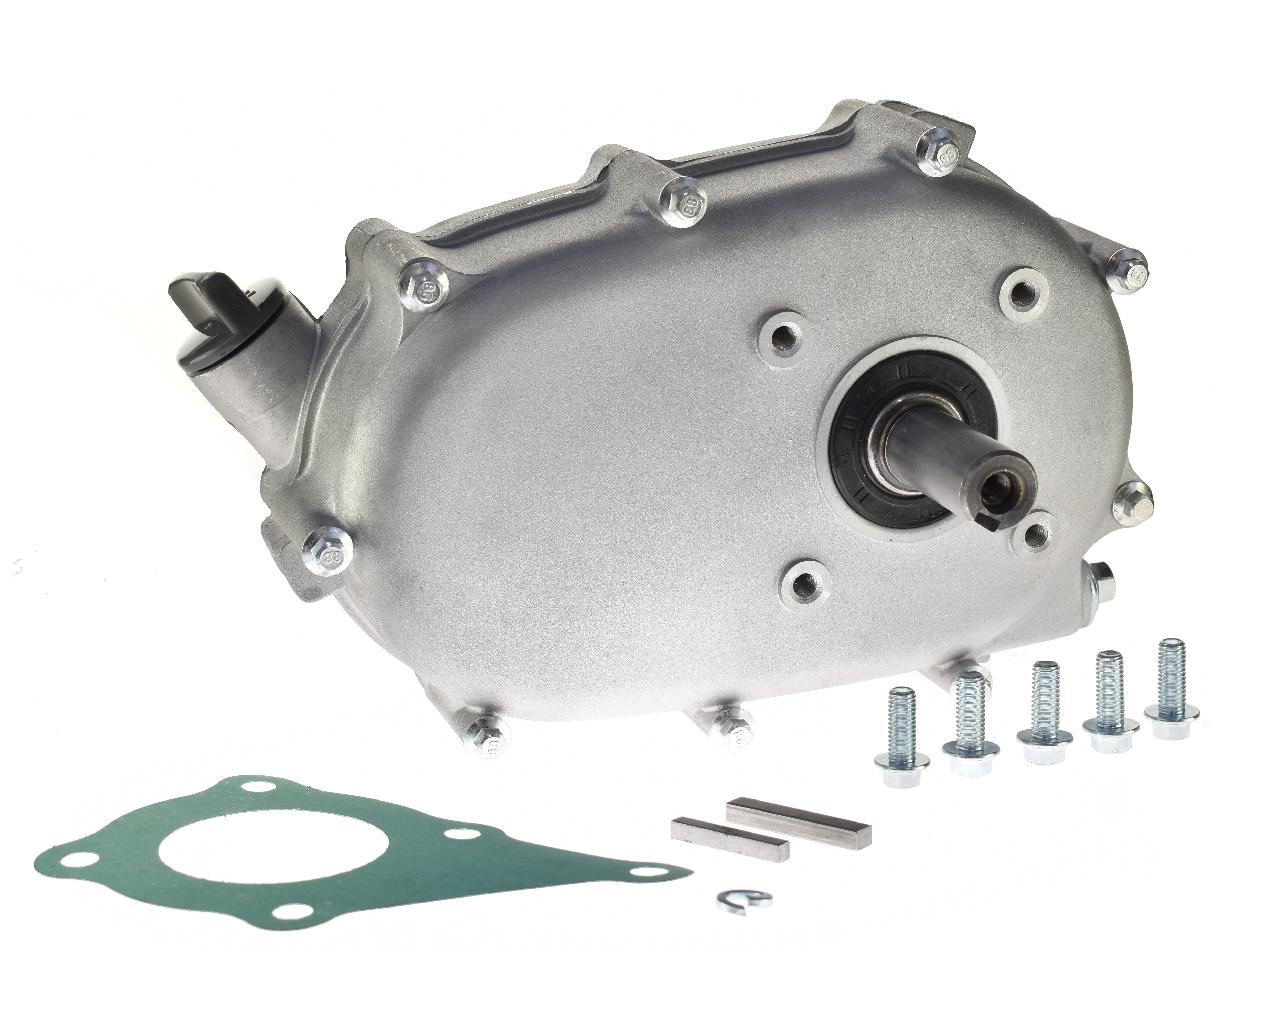 Oil clutch, complete, for Honda GX140, GX160, GX200 | keep racing